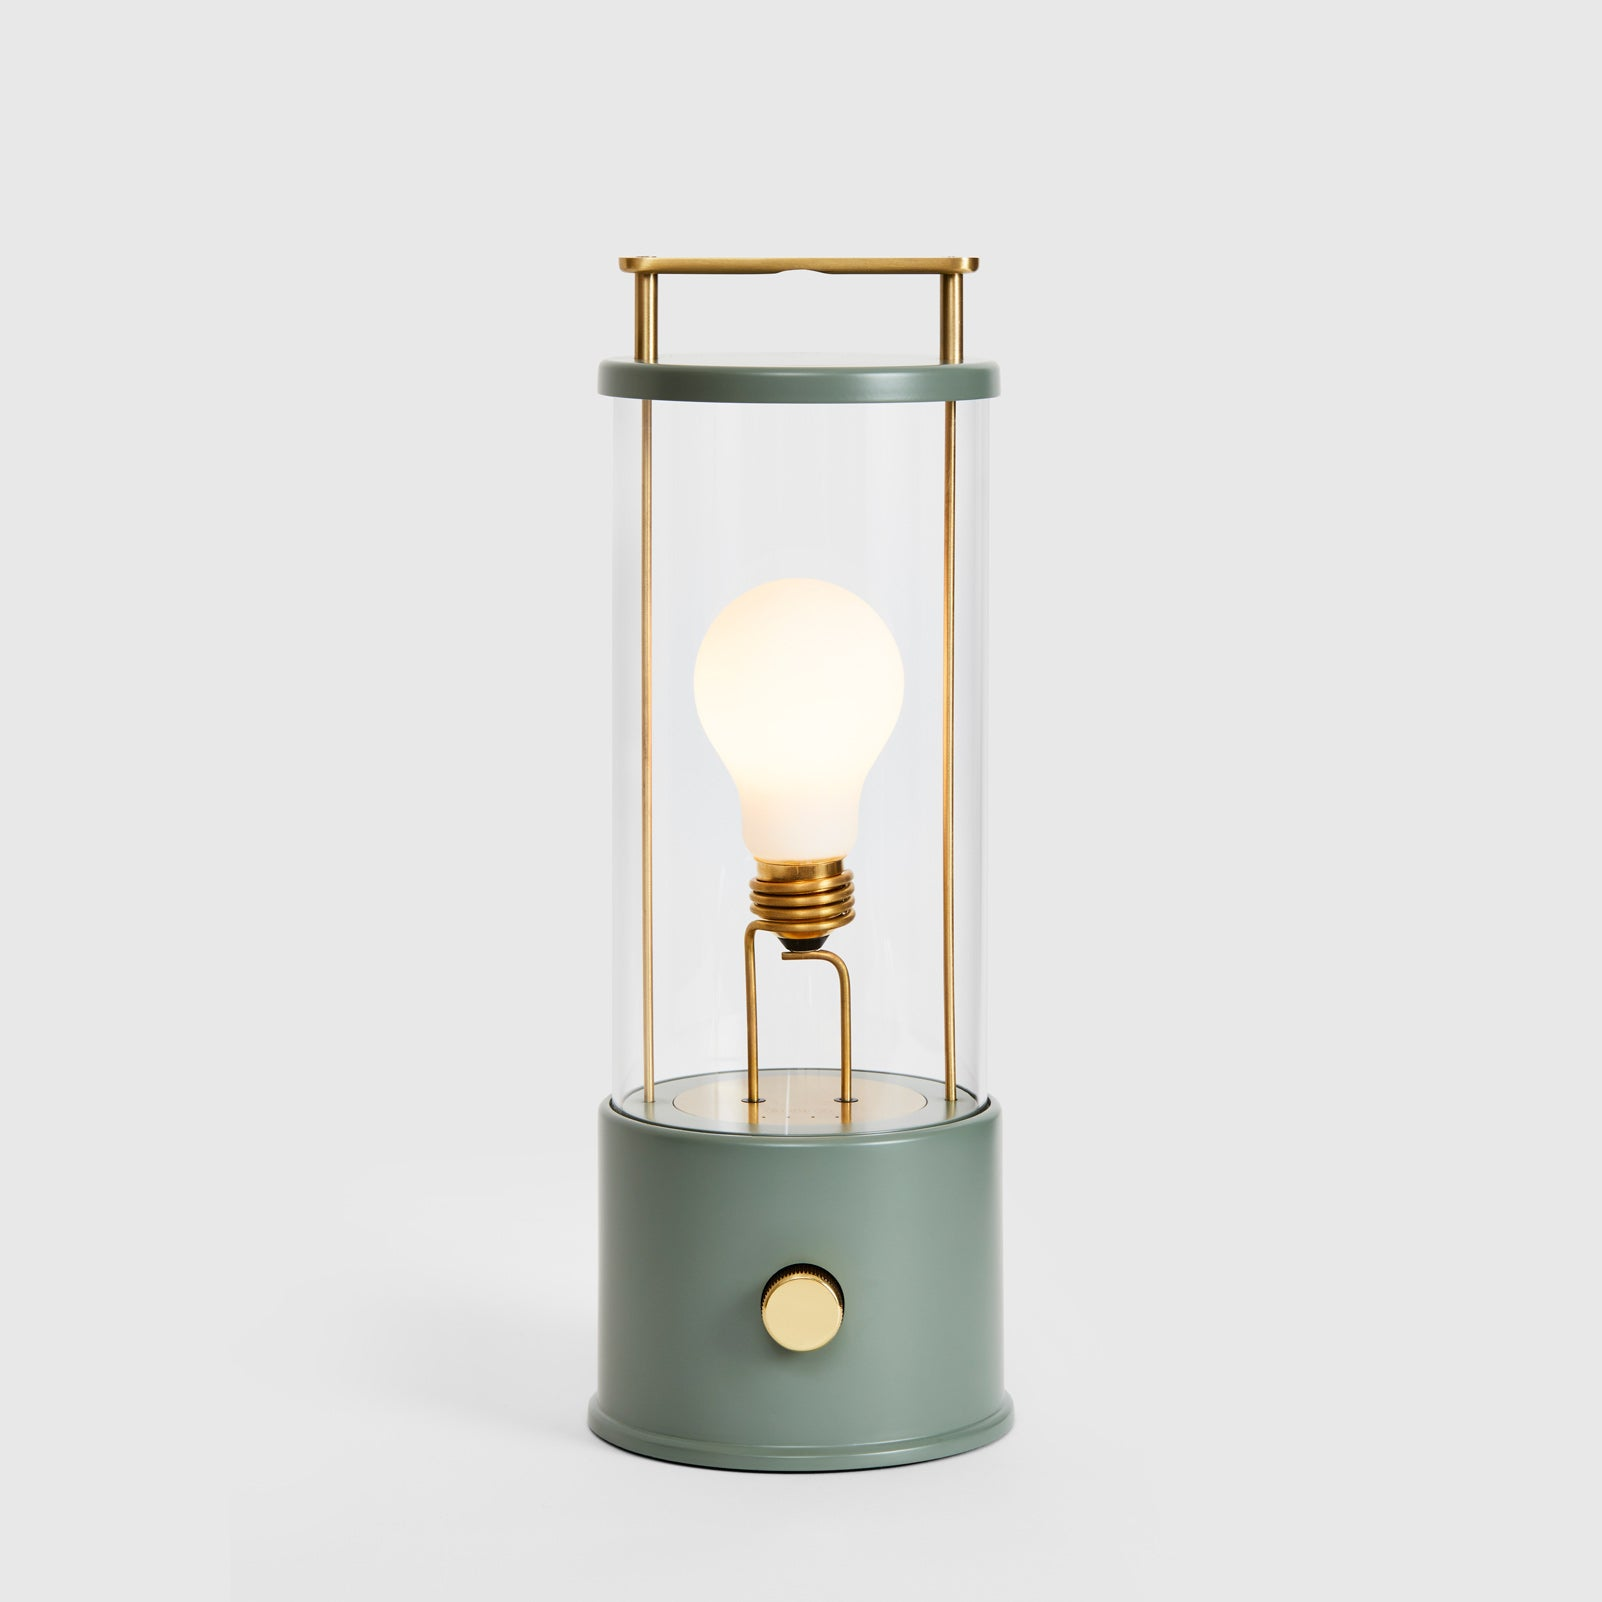 Vintage portable lamp